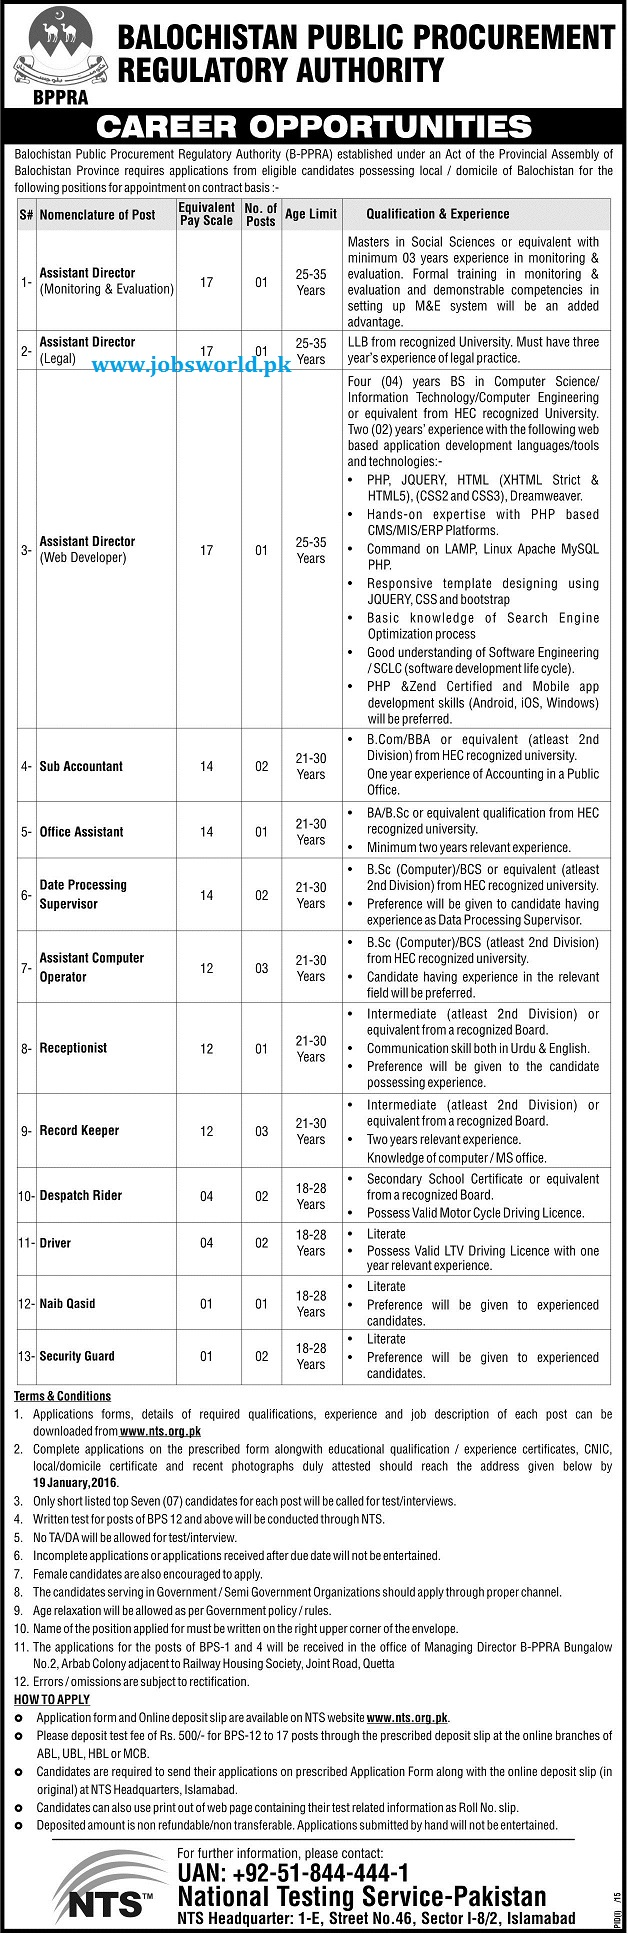 Balochistan Public Procurement Jobs 2016 BPPRA NTS Latest JobsWorld – Procurement Director Jobs